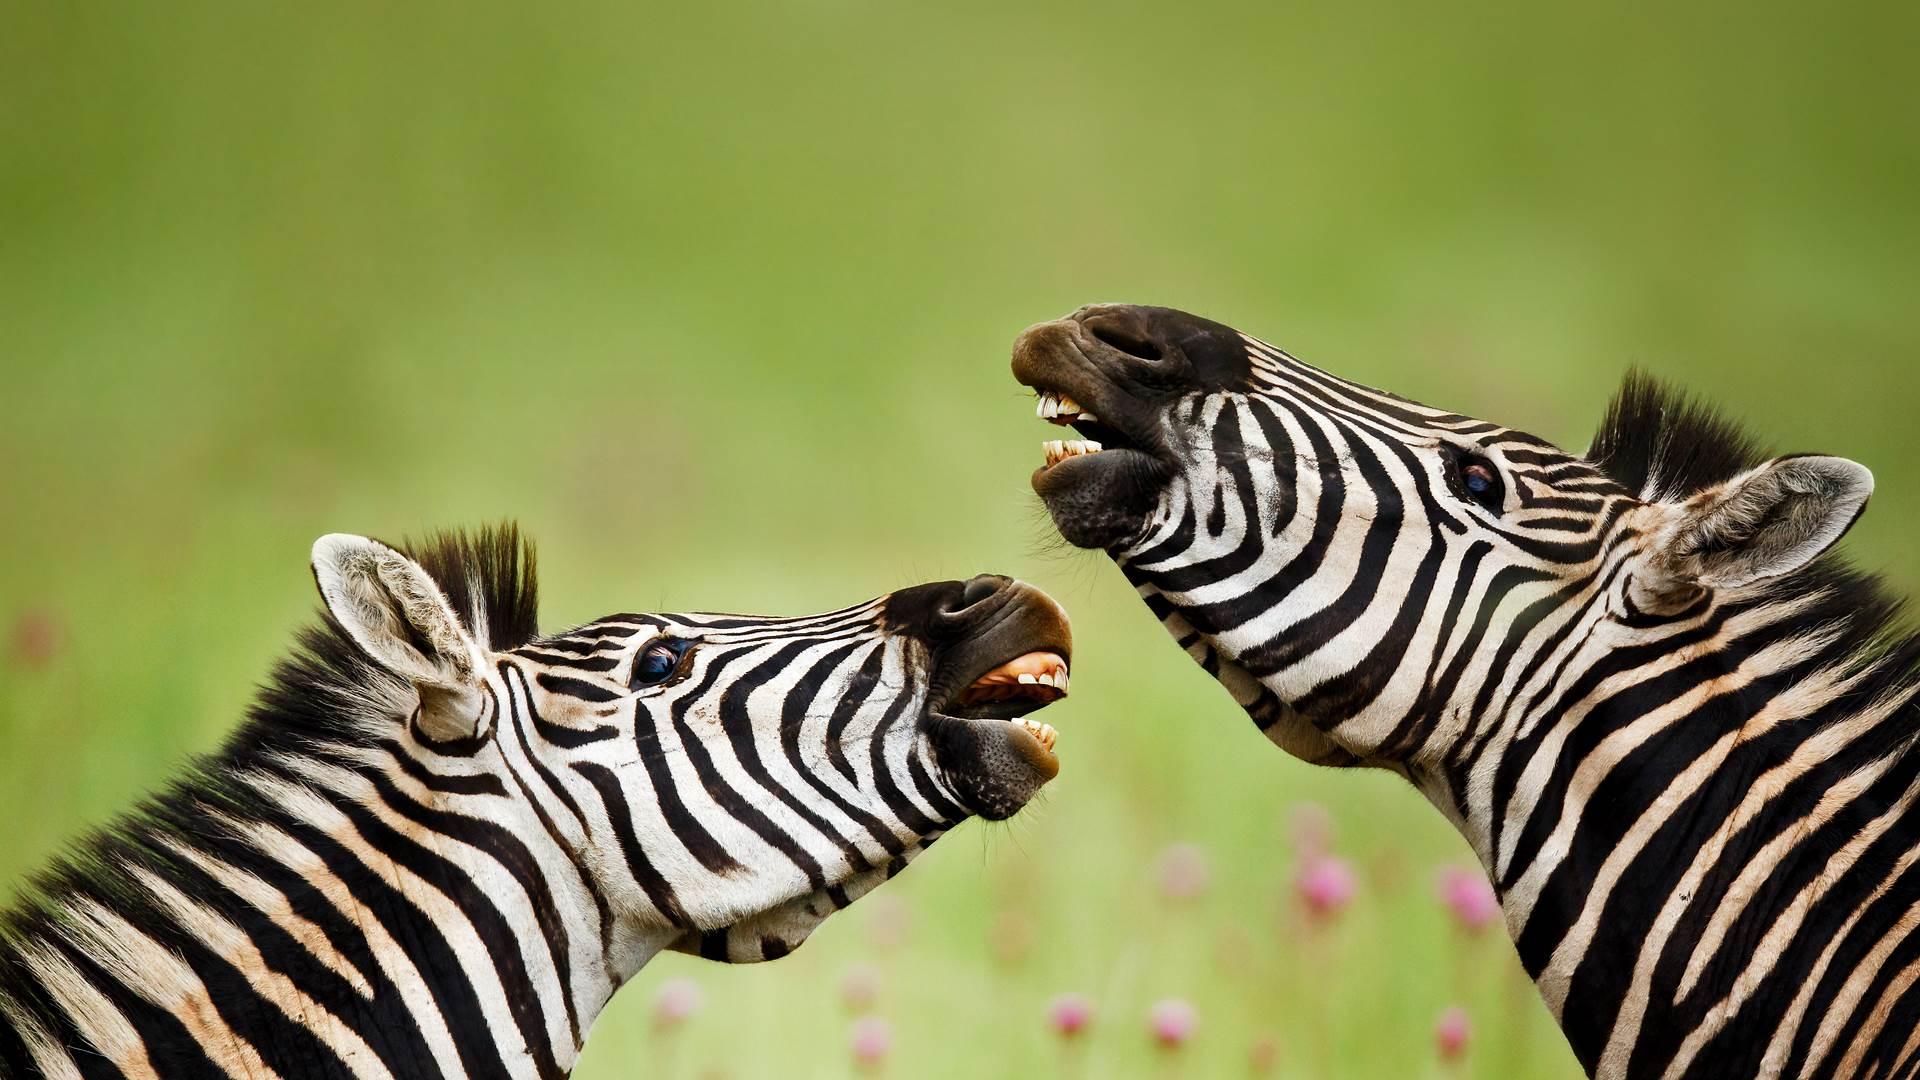 Rietvlei自然保护区内的雄性布氏斑马,南非